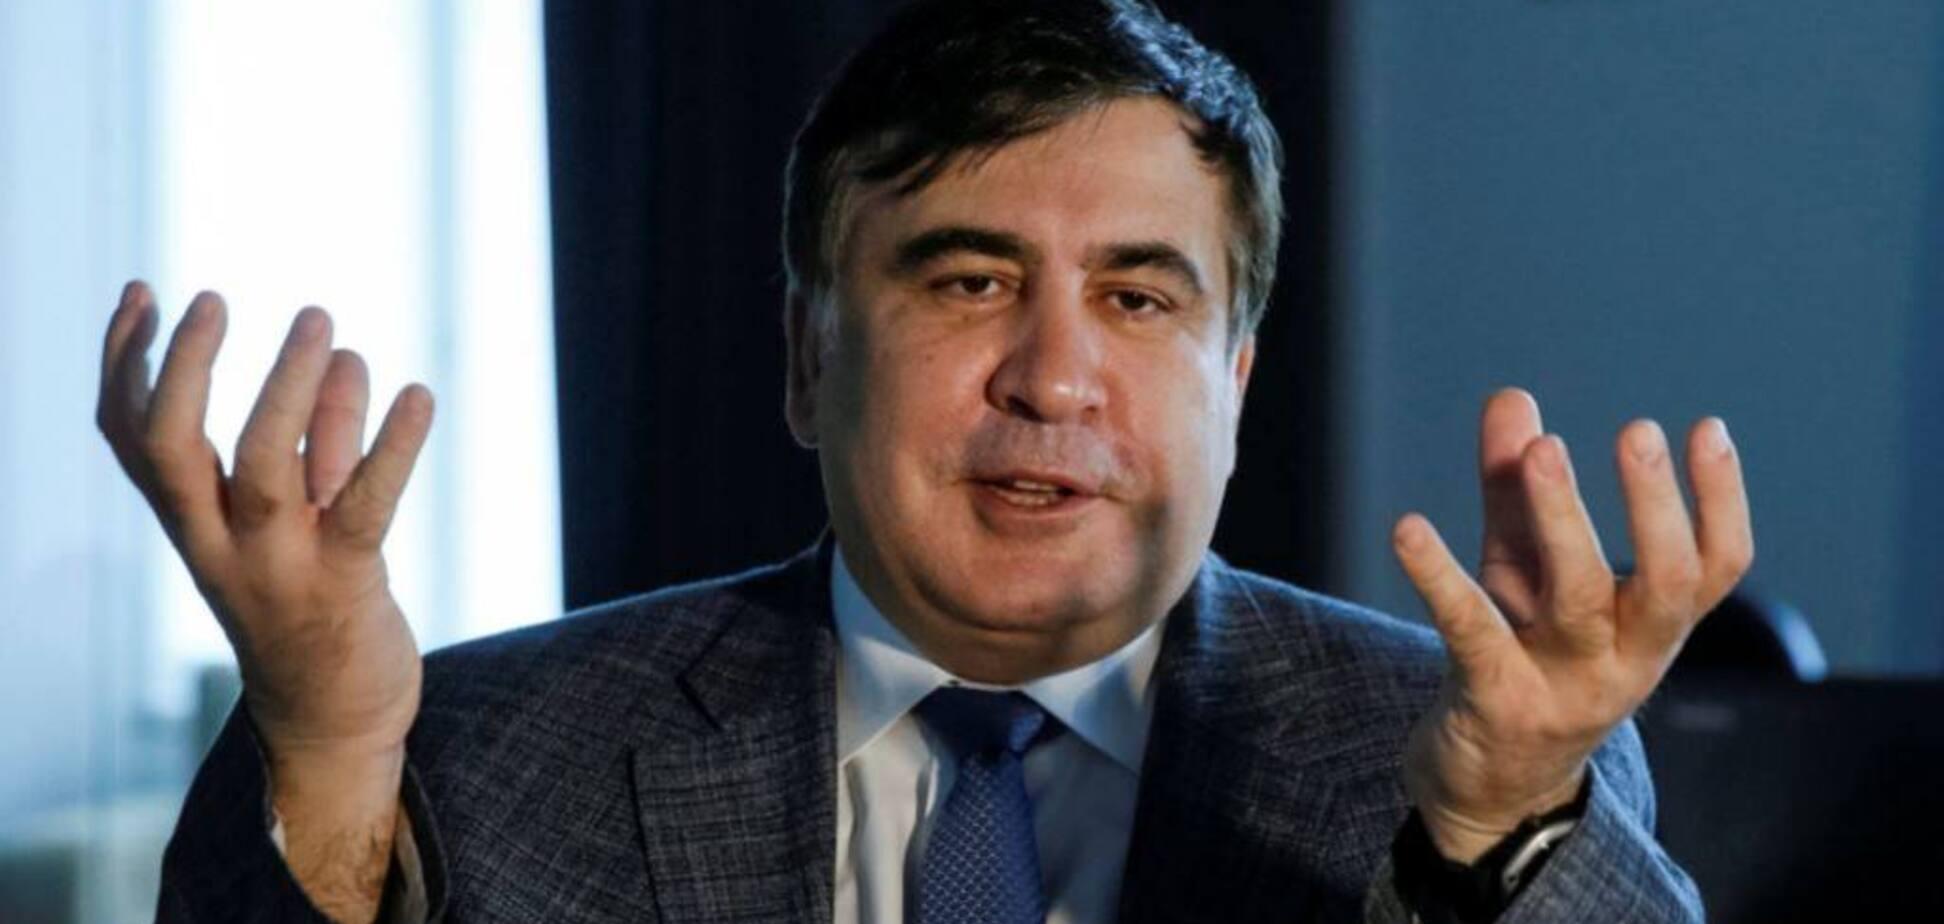 Генпрокуратура приостановила расследование дела Саакашвили: названа причина